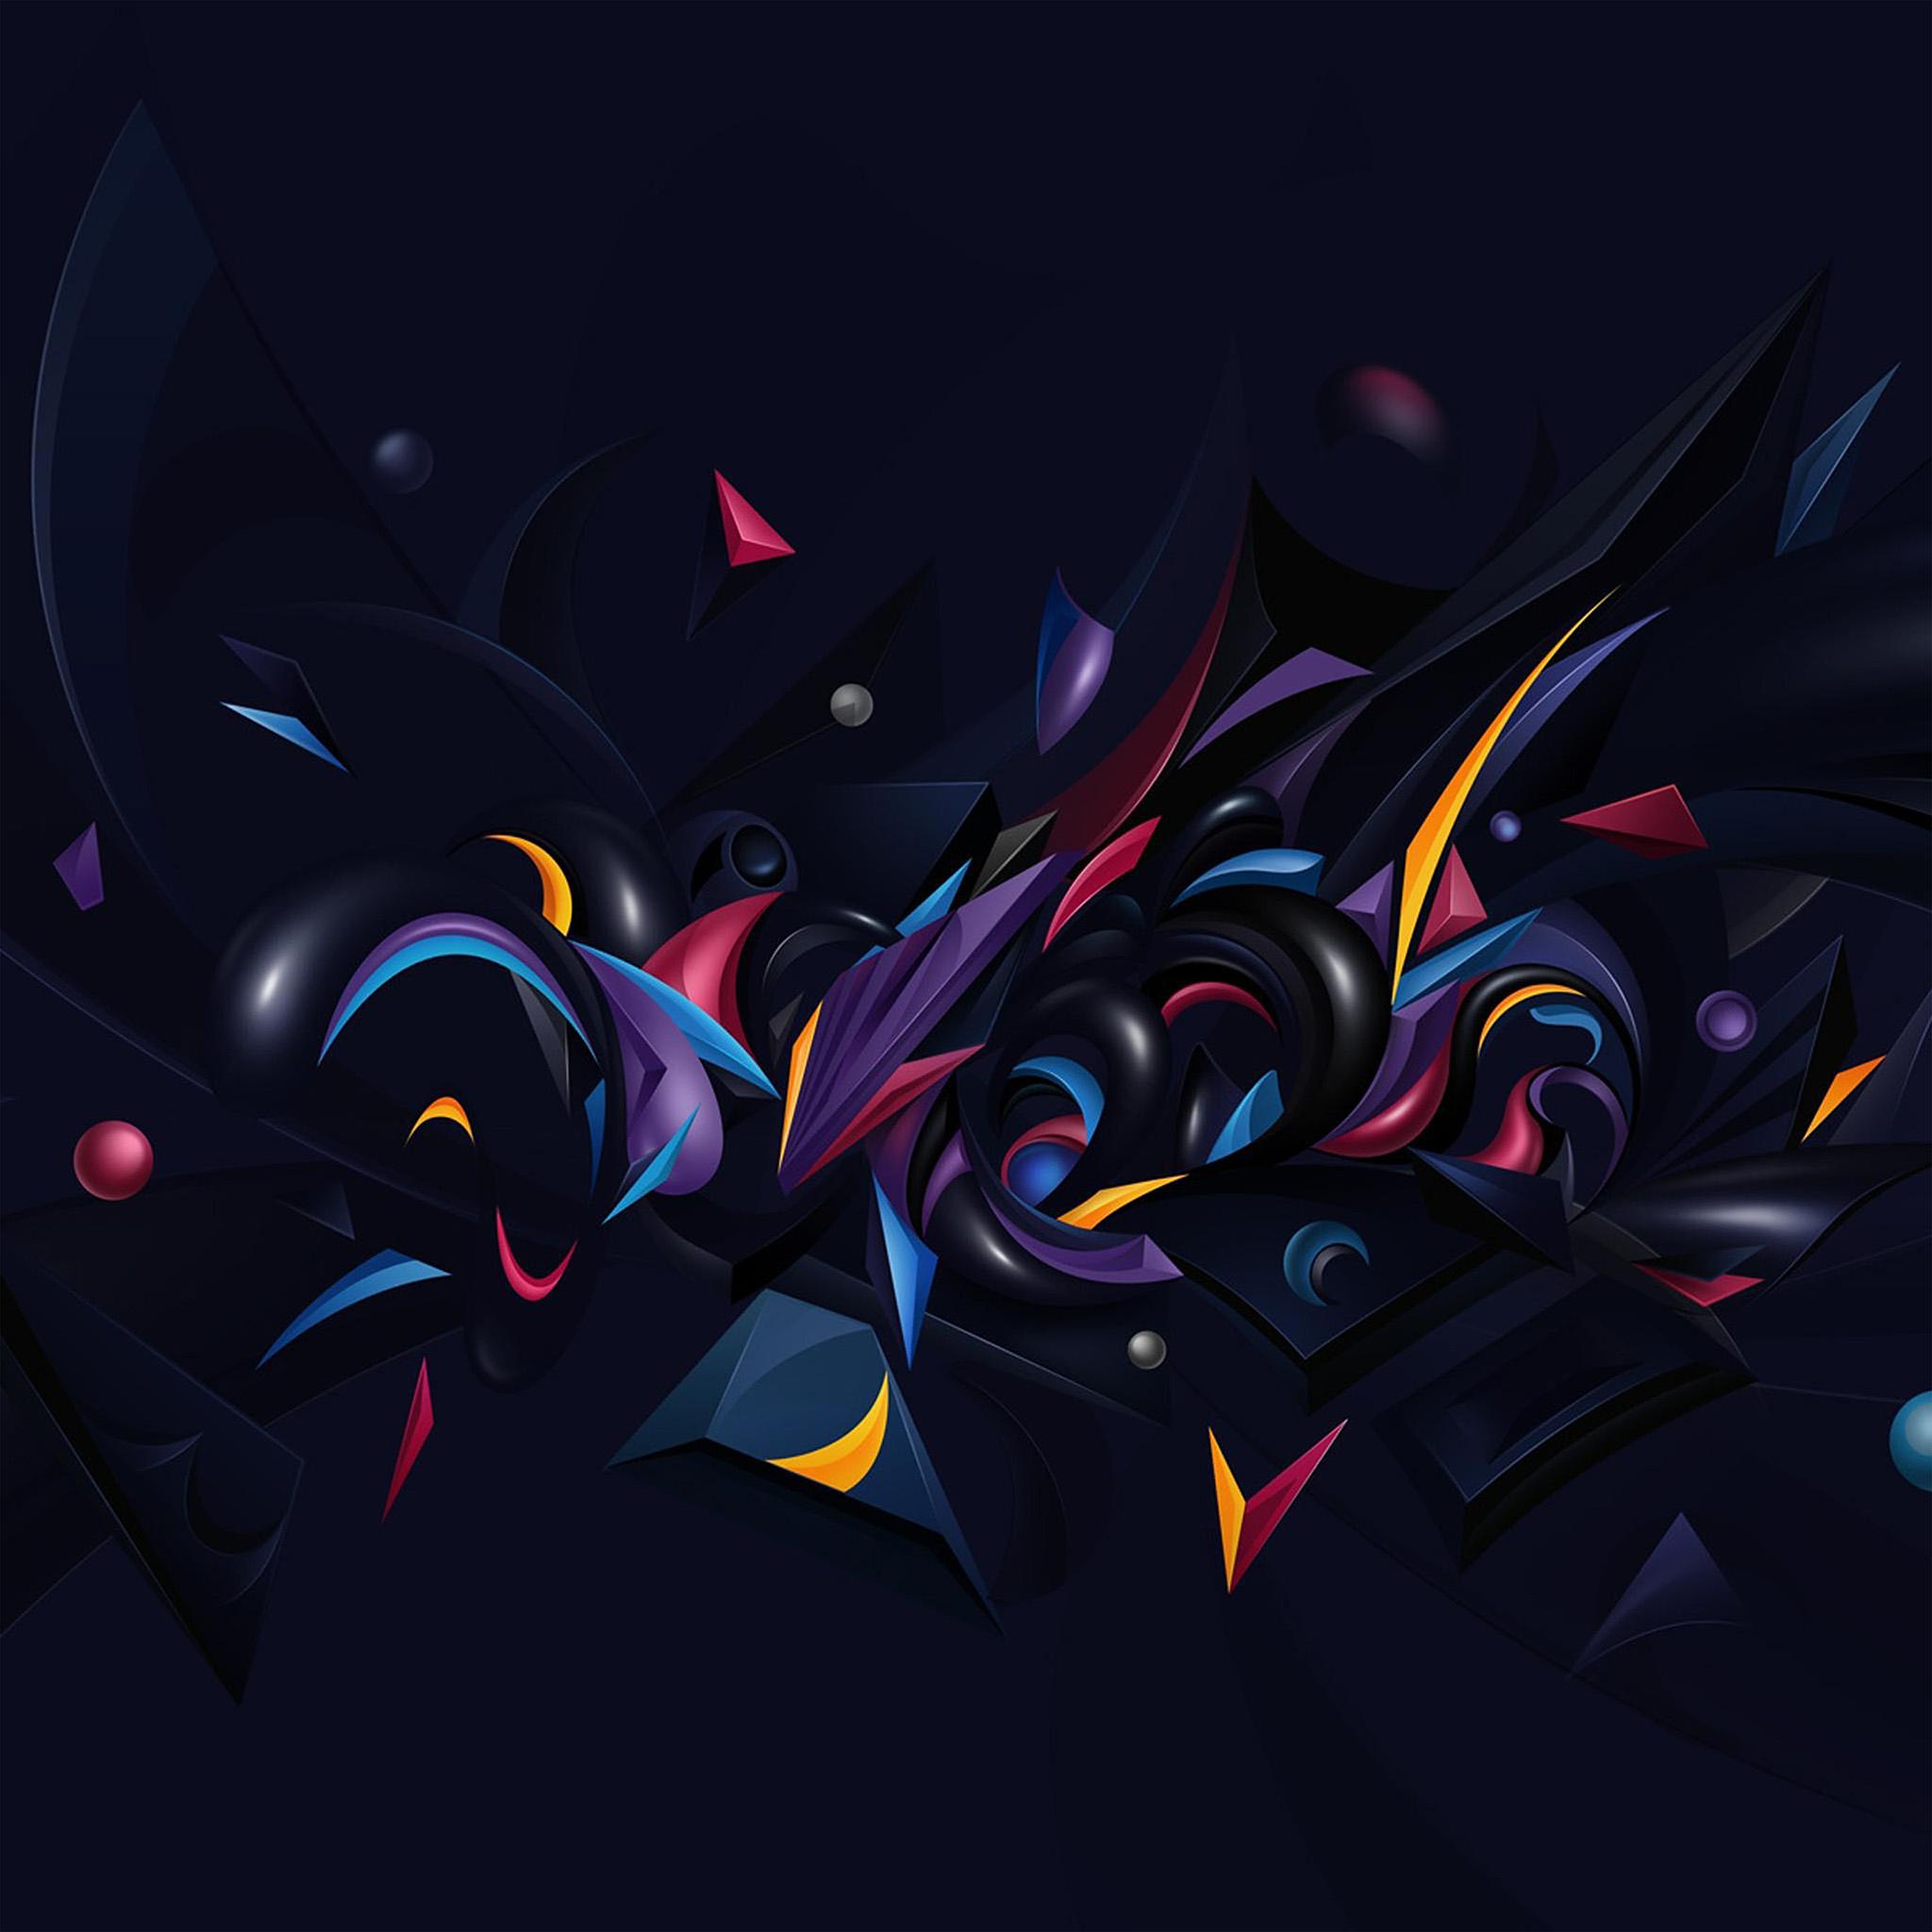 vq27-abstract-art-pattern-rainbow-wallpaper